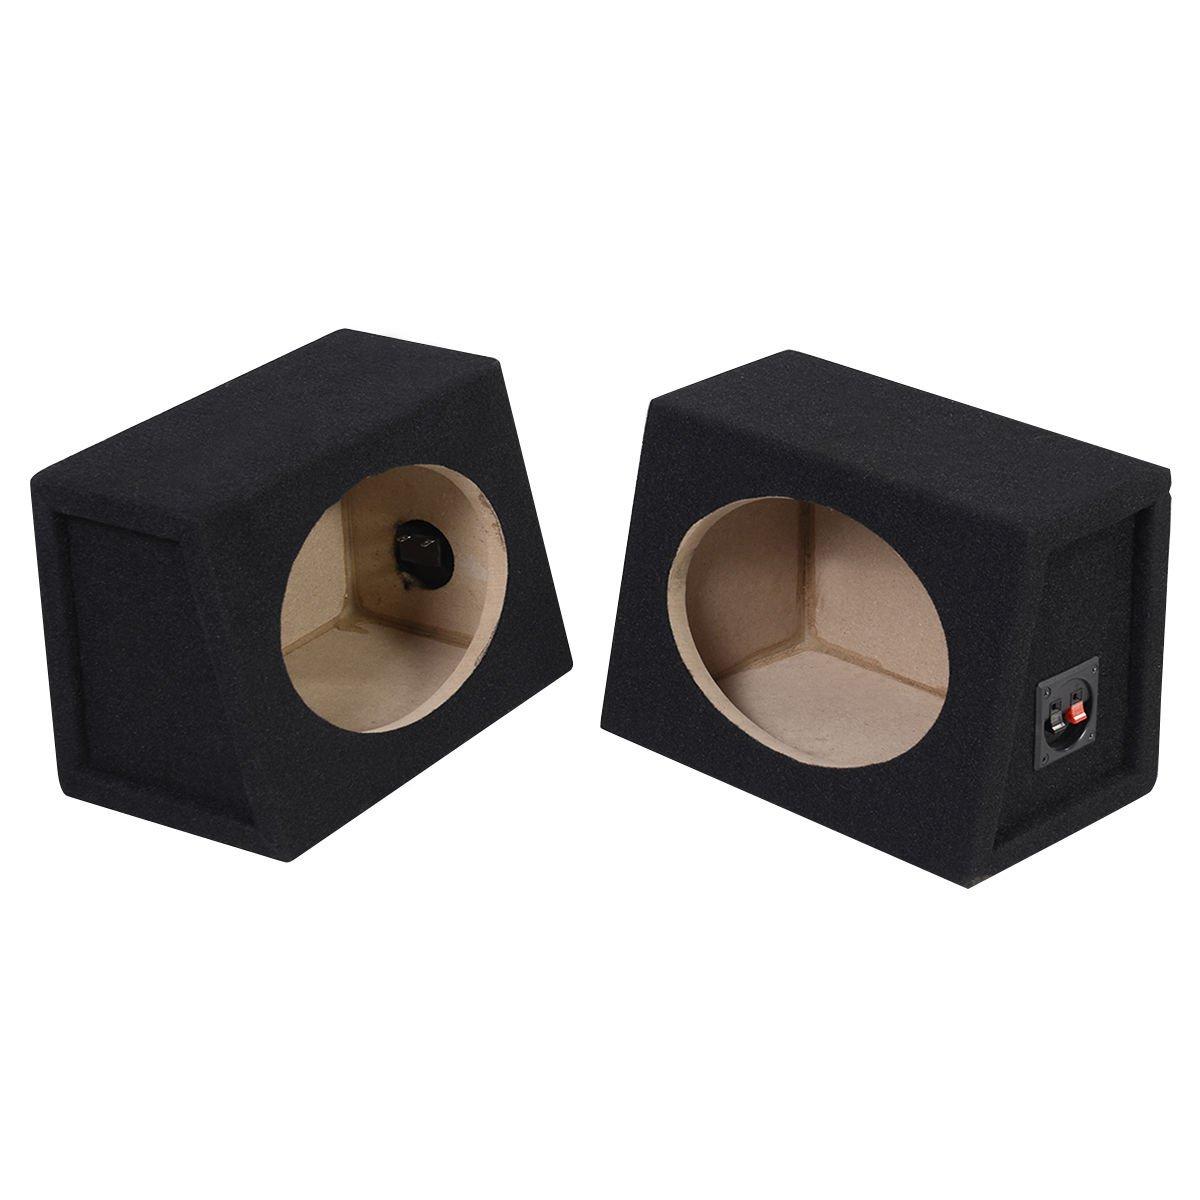 Pair Of Stereo Car Audio 6X9 Wedge Speaker Universal 6 x 9 Enclosure Boxes